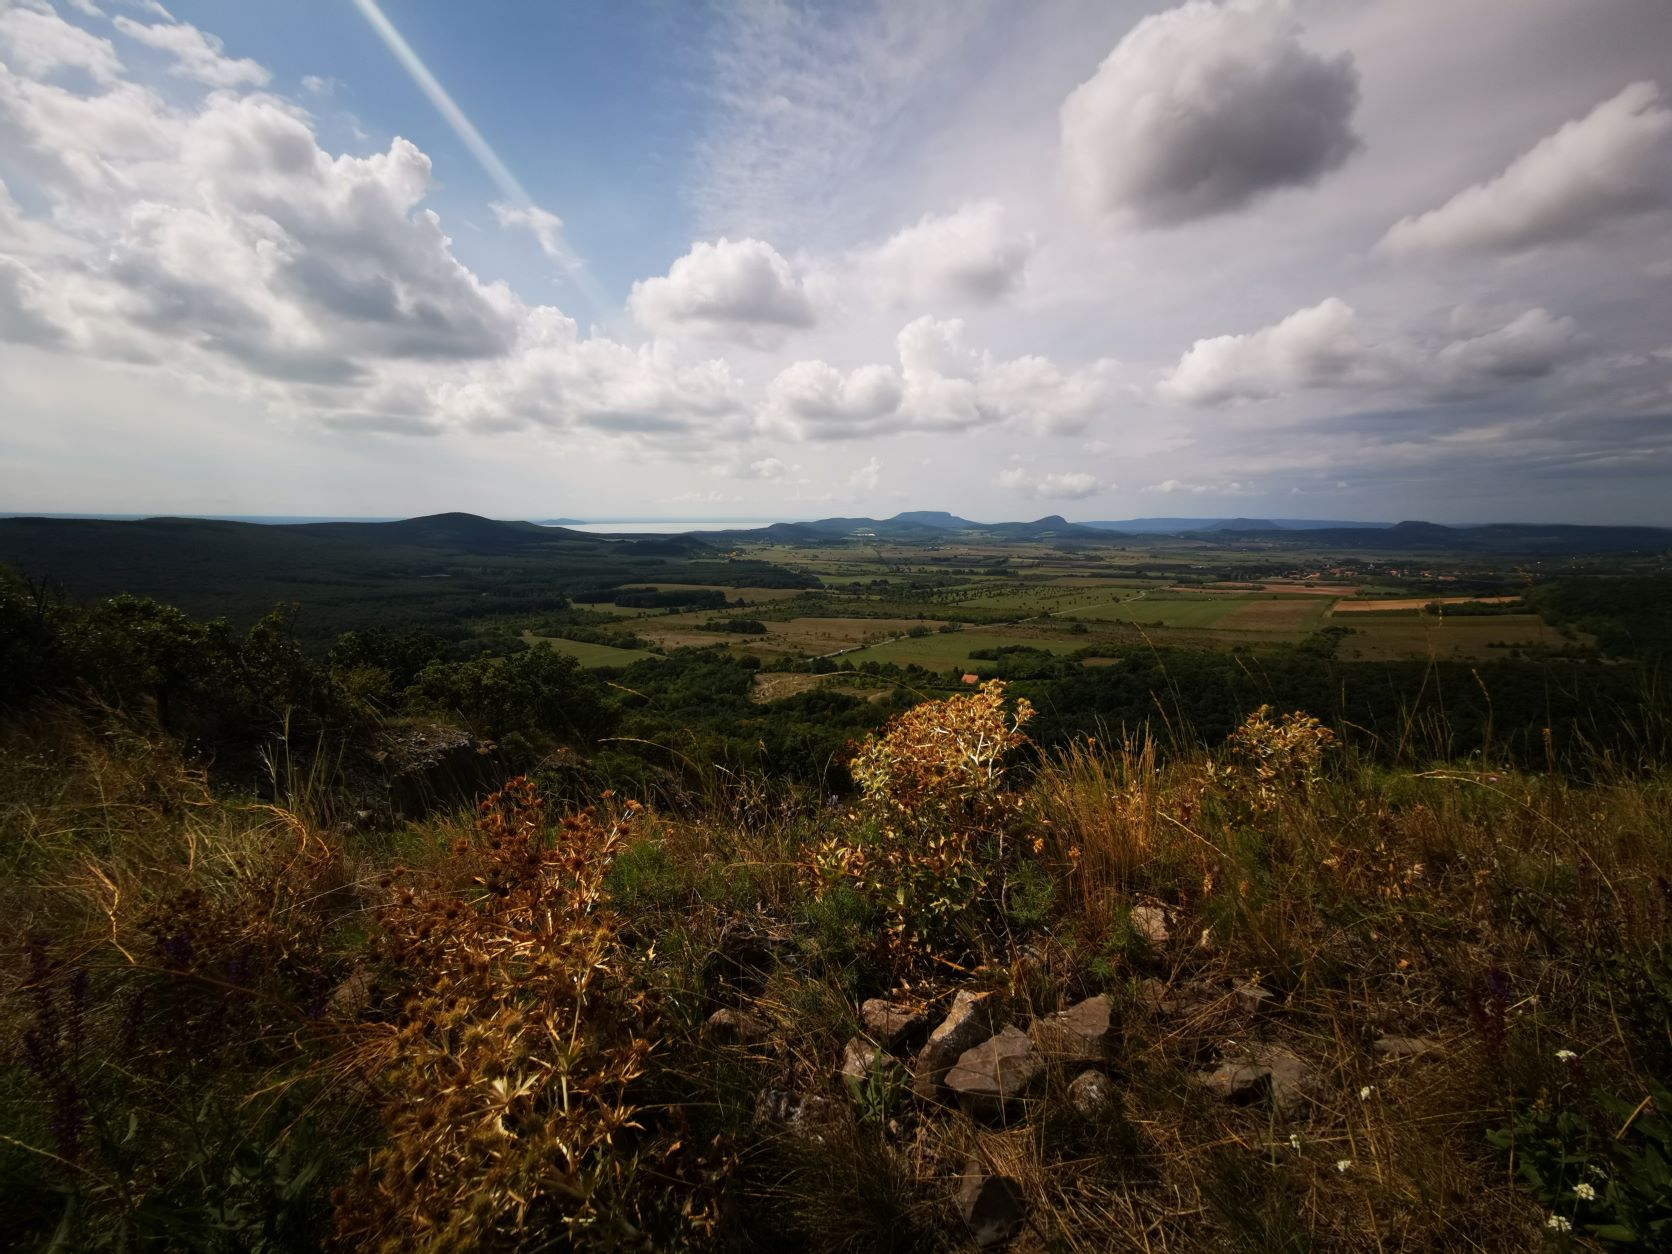 A gyönyörű balaton-felvidéki panoráma